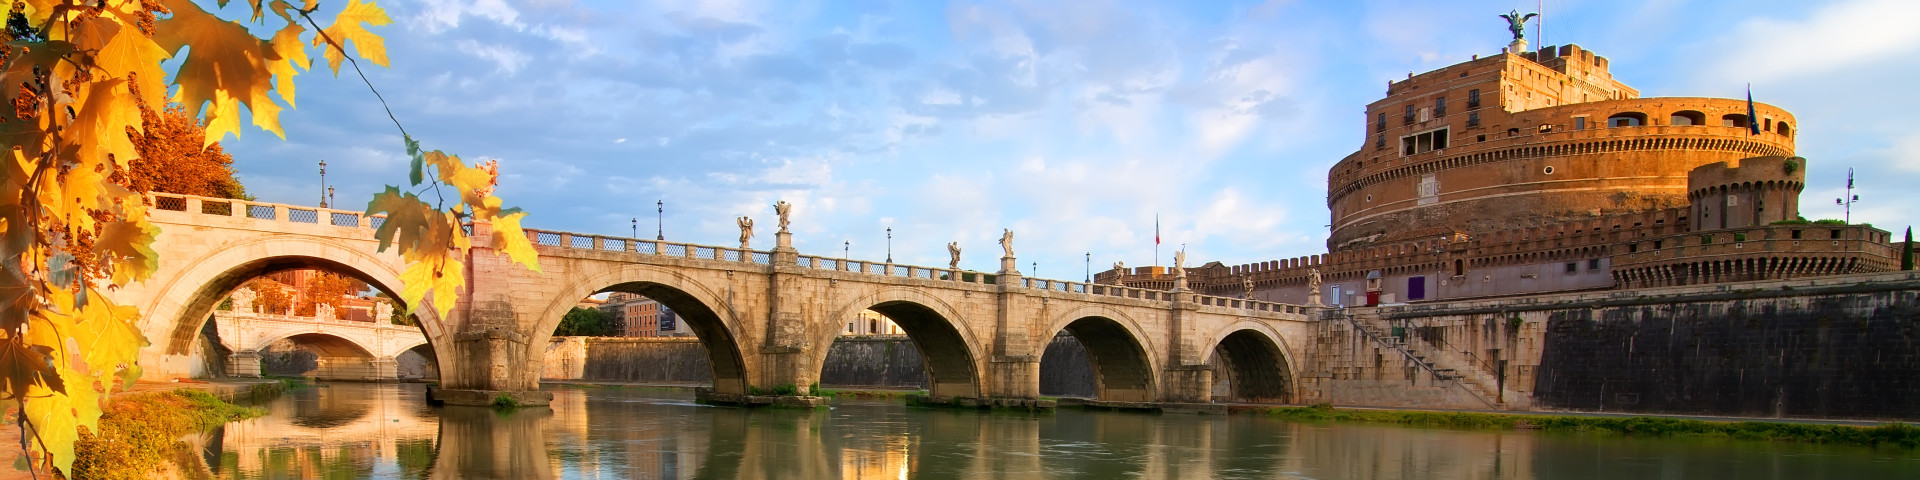 Roma - Ponte di Sant'Angelo